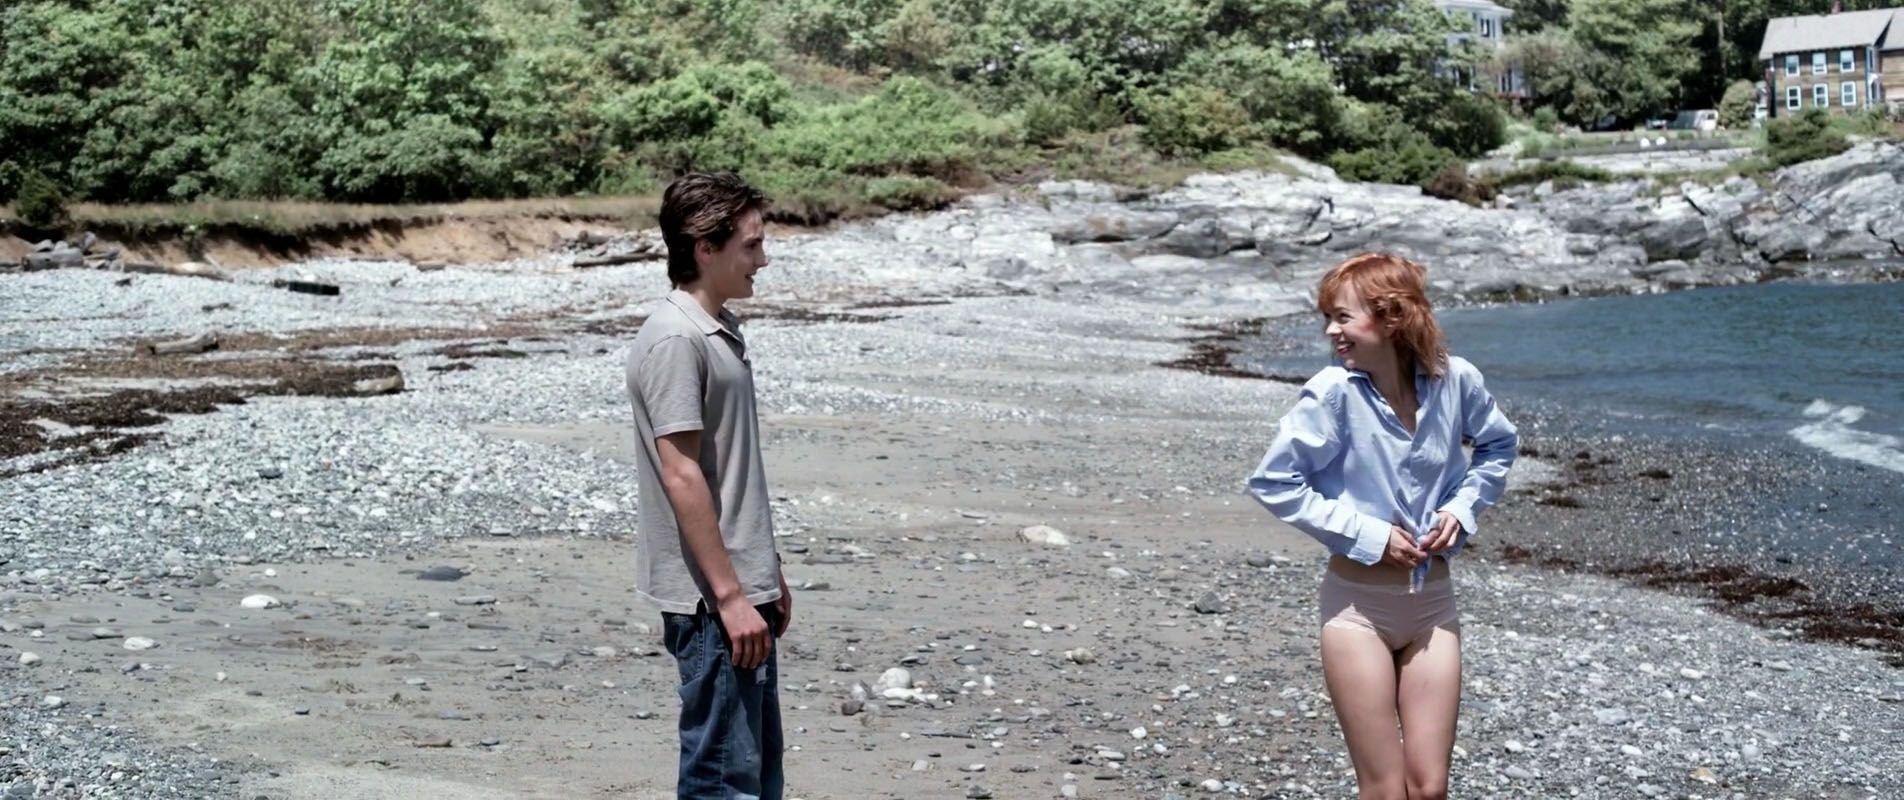 Голая порно звезда Brittany O'Connel смотреть онлайн 2 фото